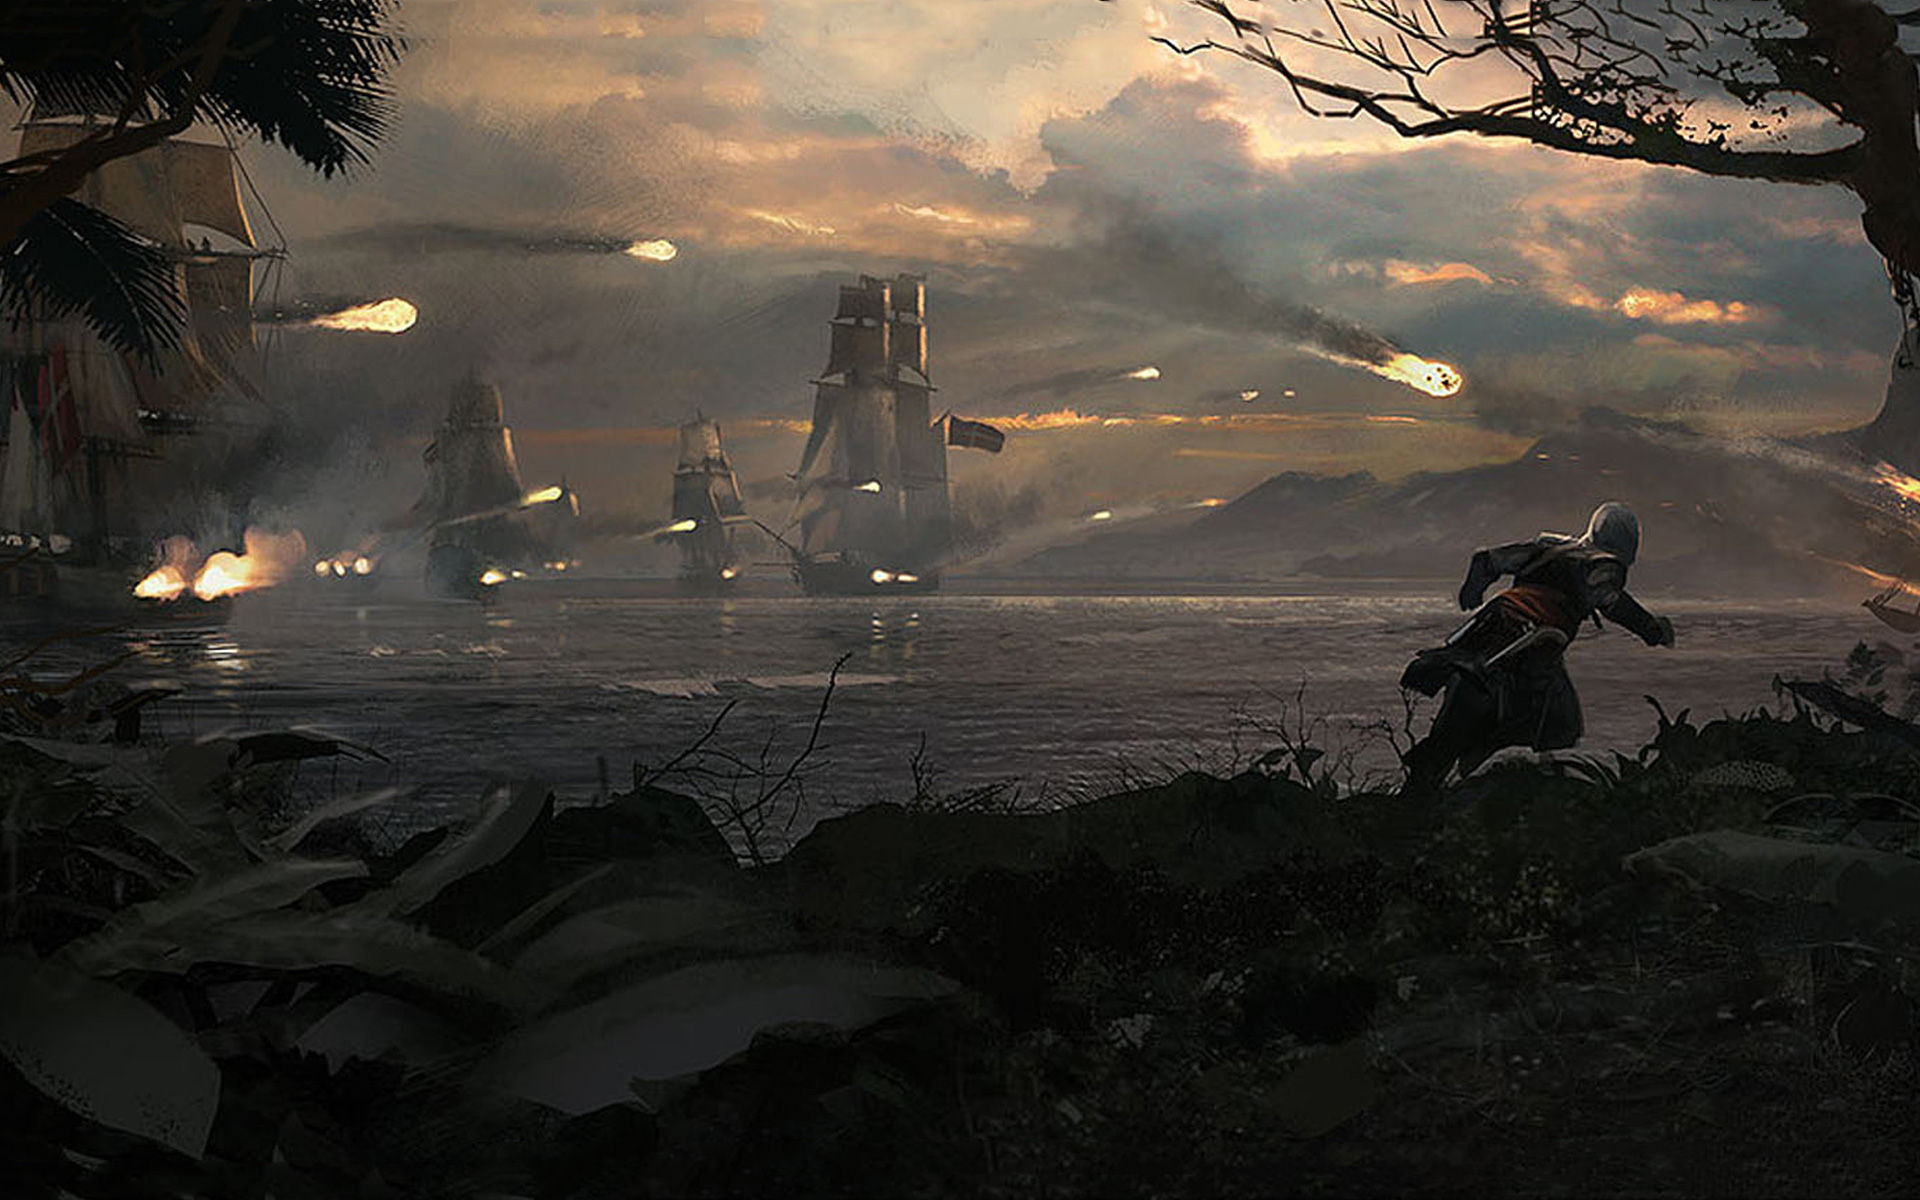 Assassin's Creed IV: Black Flag Wallpaper in 1920x1200